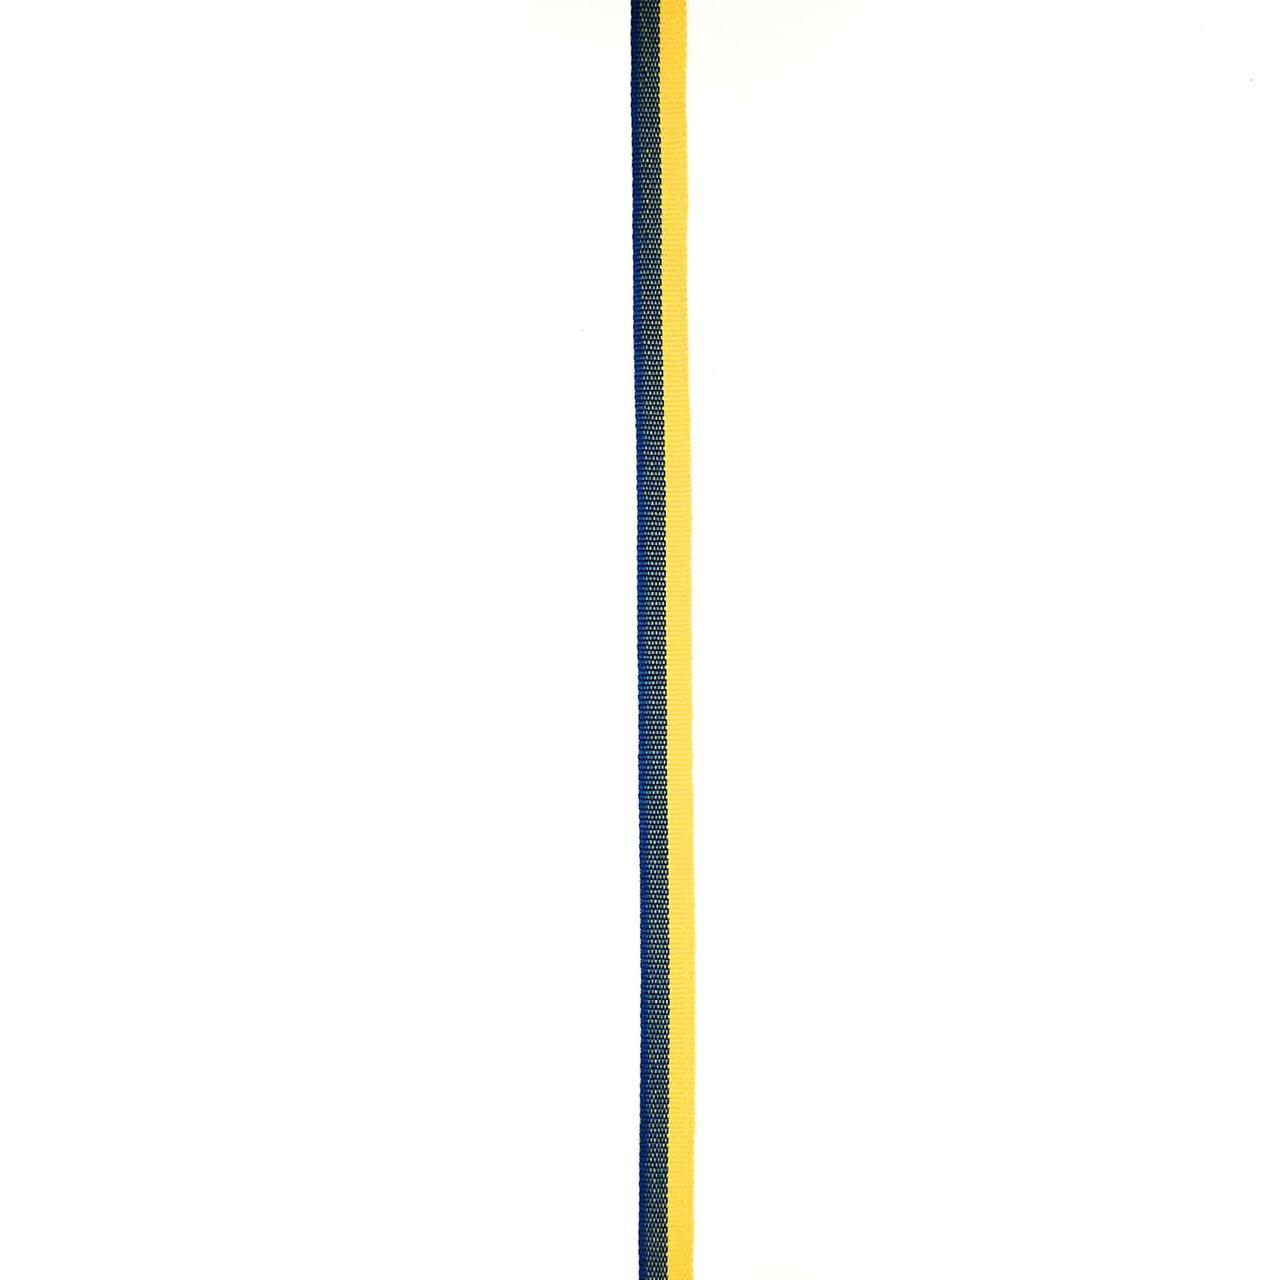 Стрічка національна 5 мм (50м/рулон)